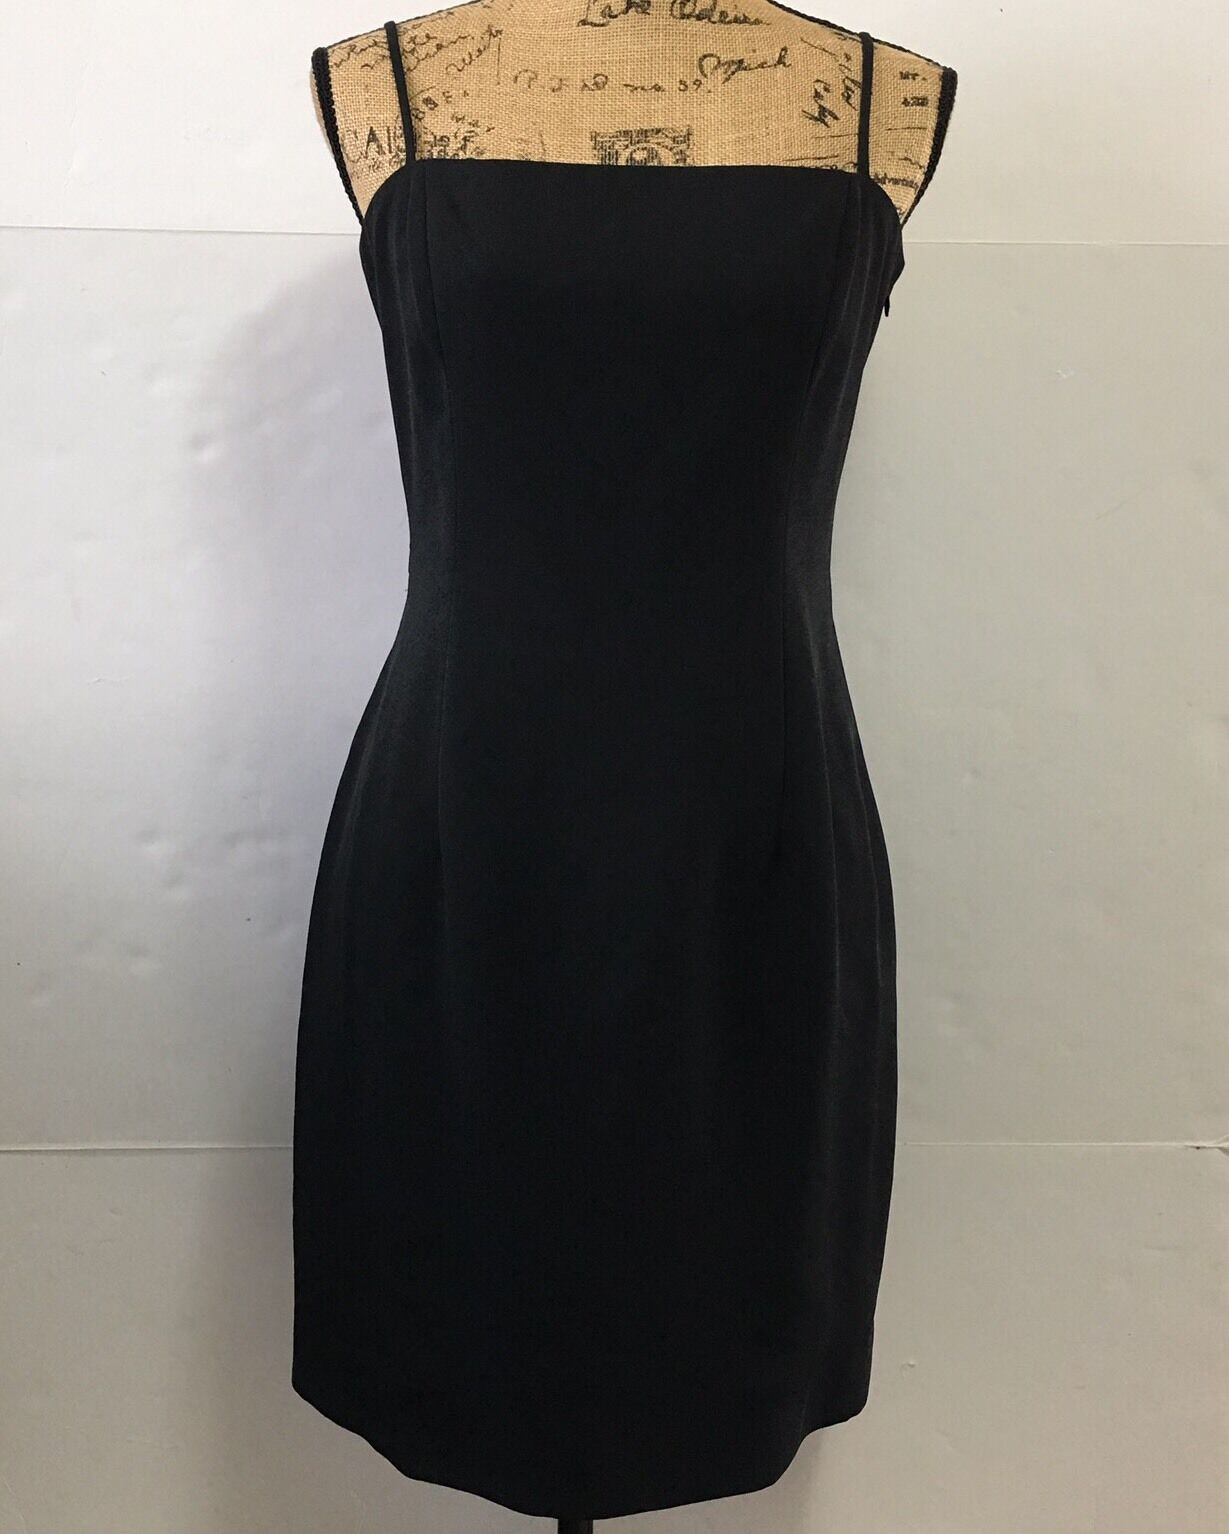 Laundry Shelli Segal Little schwarz Dress Short Sleeveless Cocktail Bow Größe 10